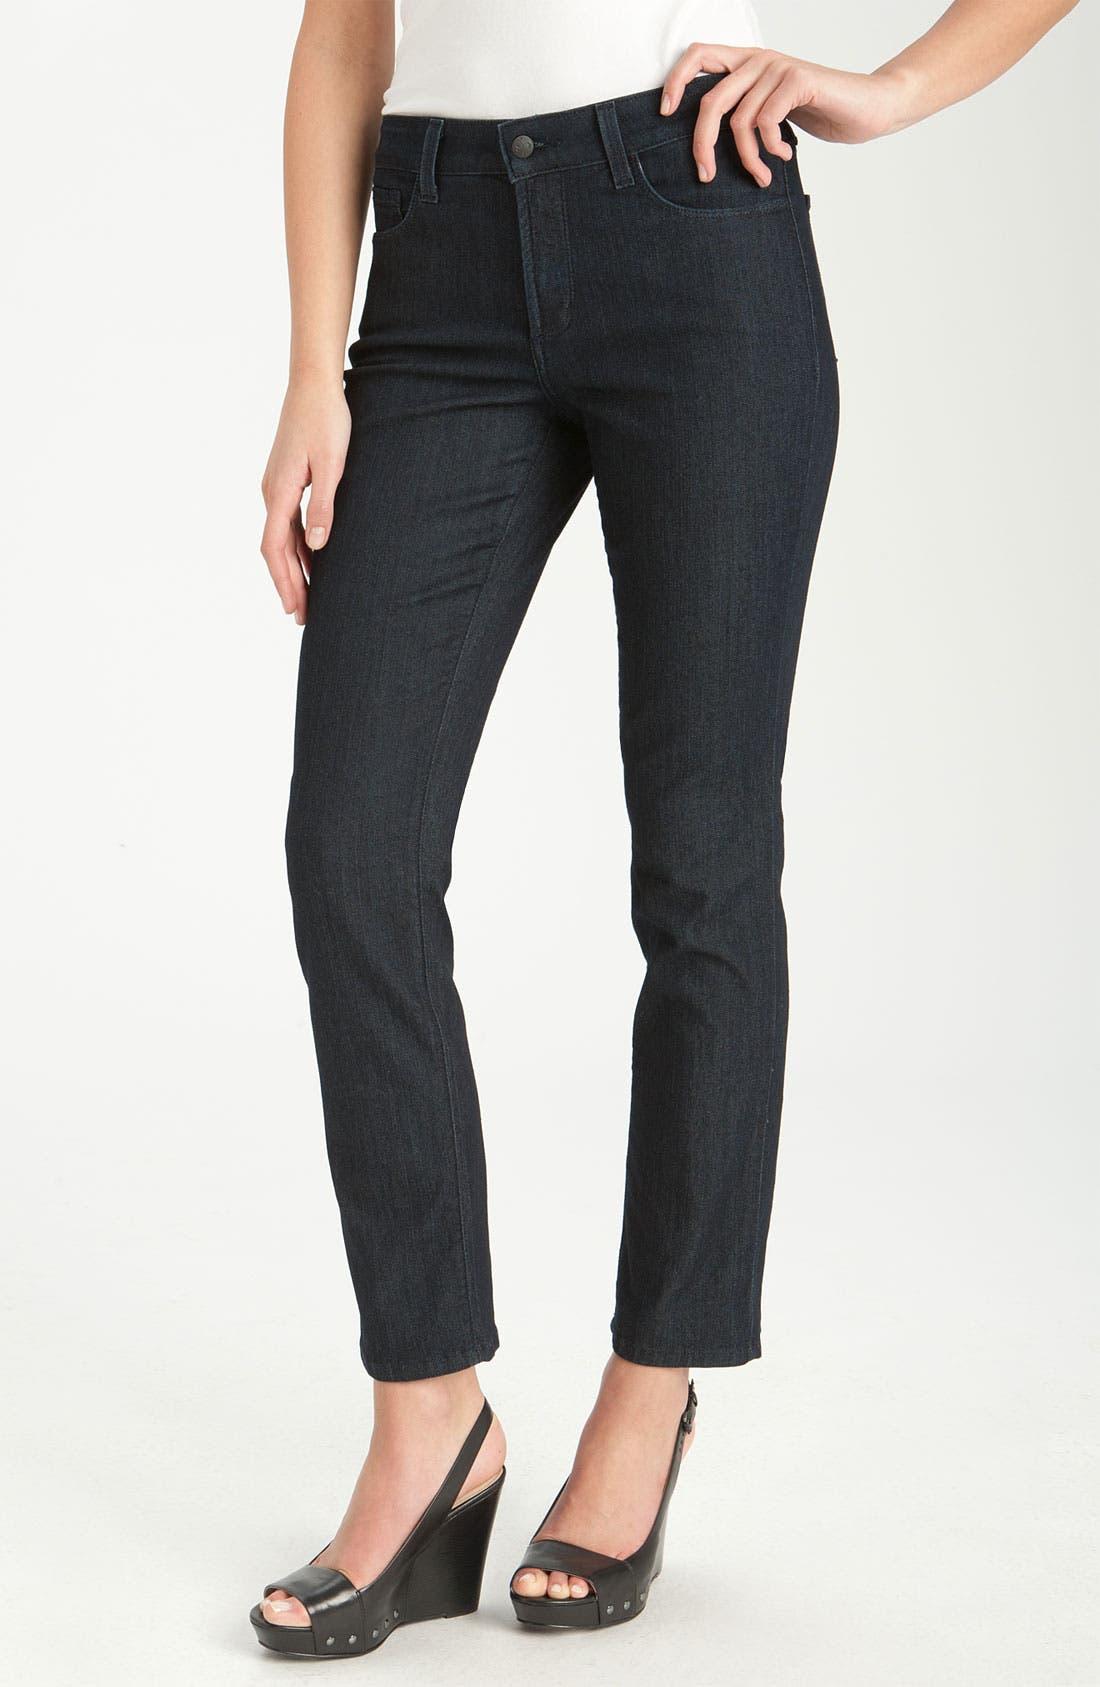 Main Image - NYDJ 'Sheri' Skinny Stretch Jeans (Petite)